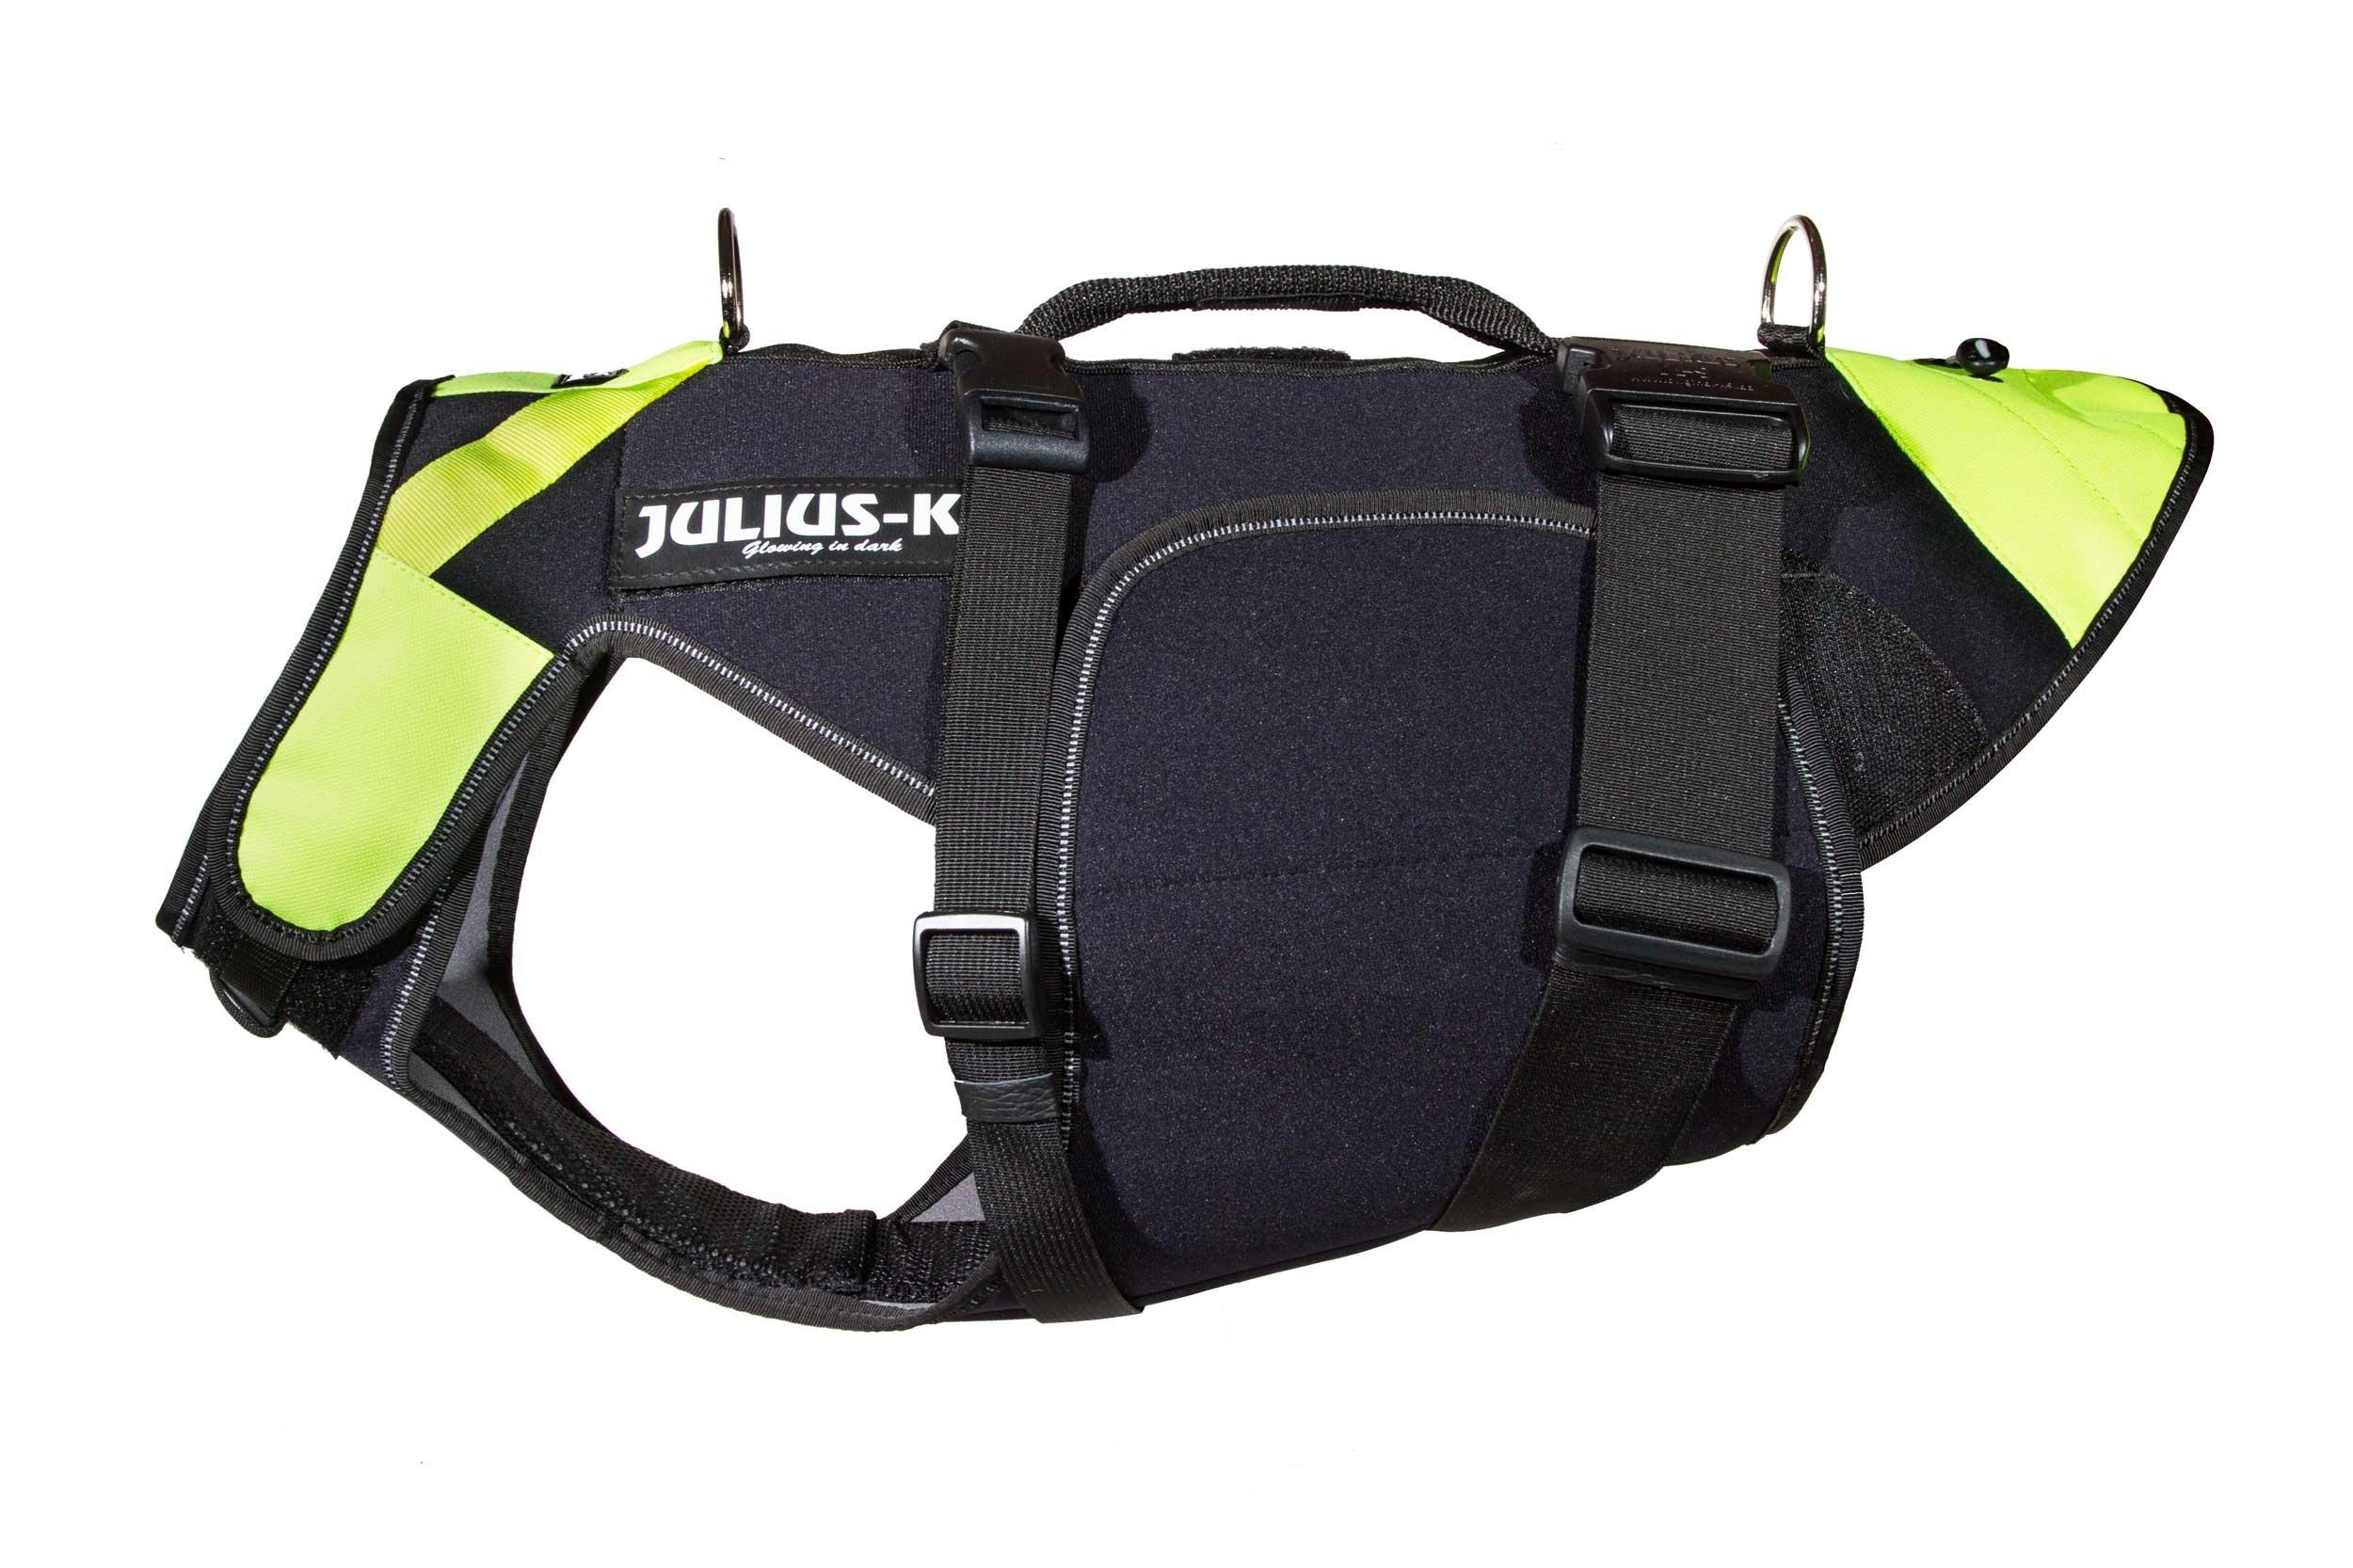 JULIUS-K9 IDC Multifunctional Dog Harness made of neoprene | Size: L (chest measurement: 25,5-32,5''/65-82 cm)